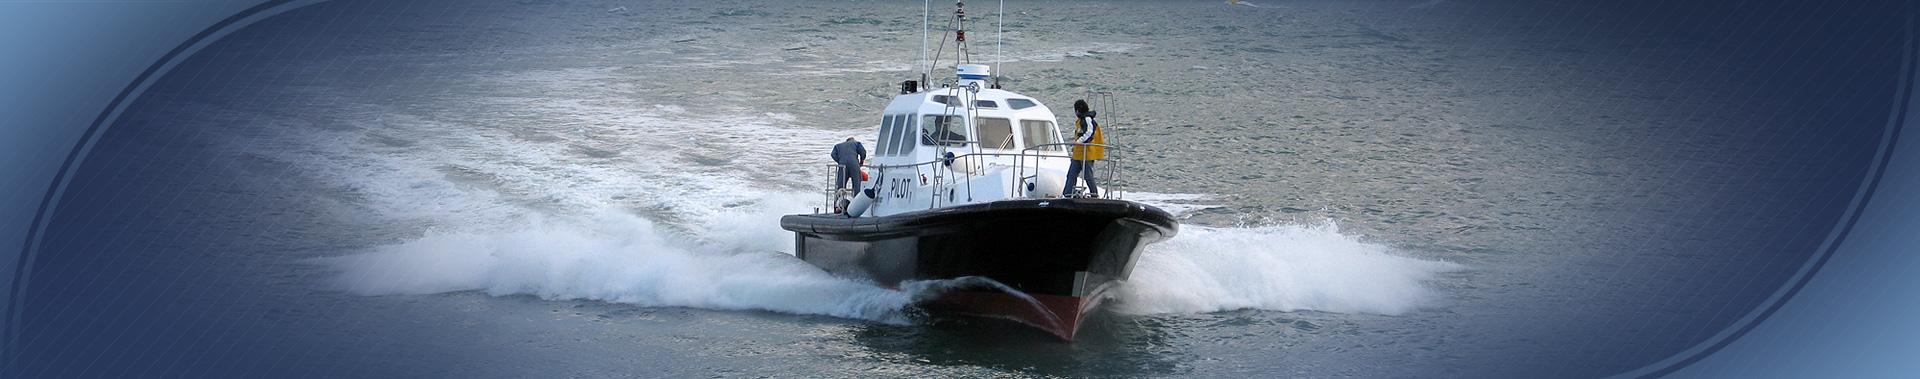 bg-slider2-operations-porturaires